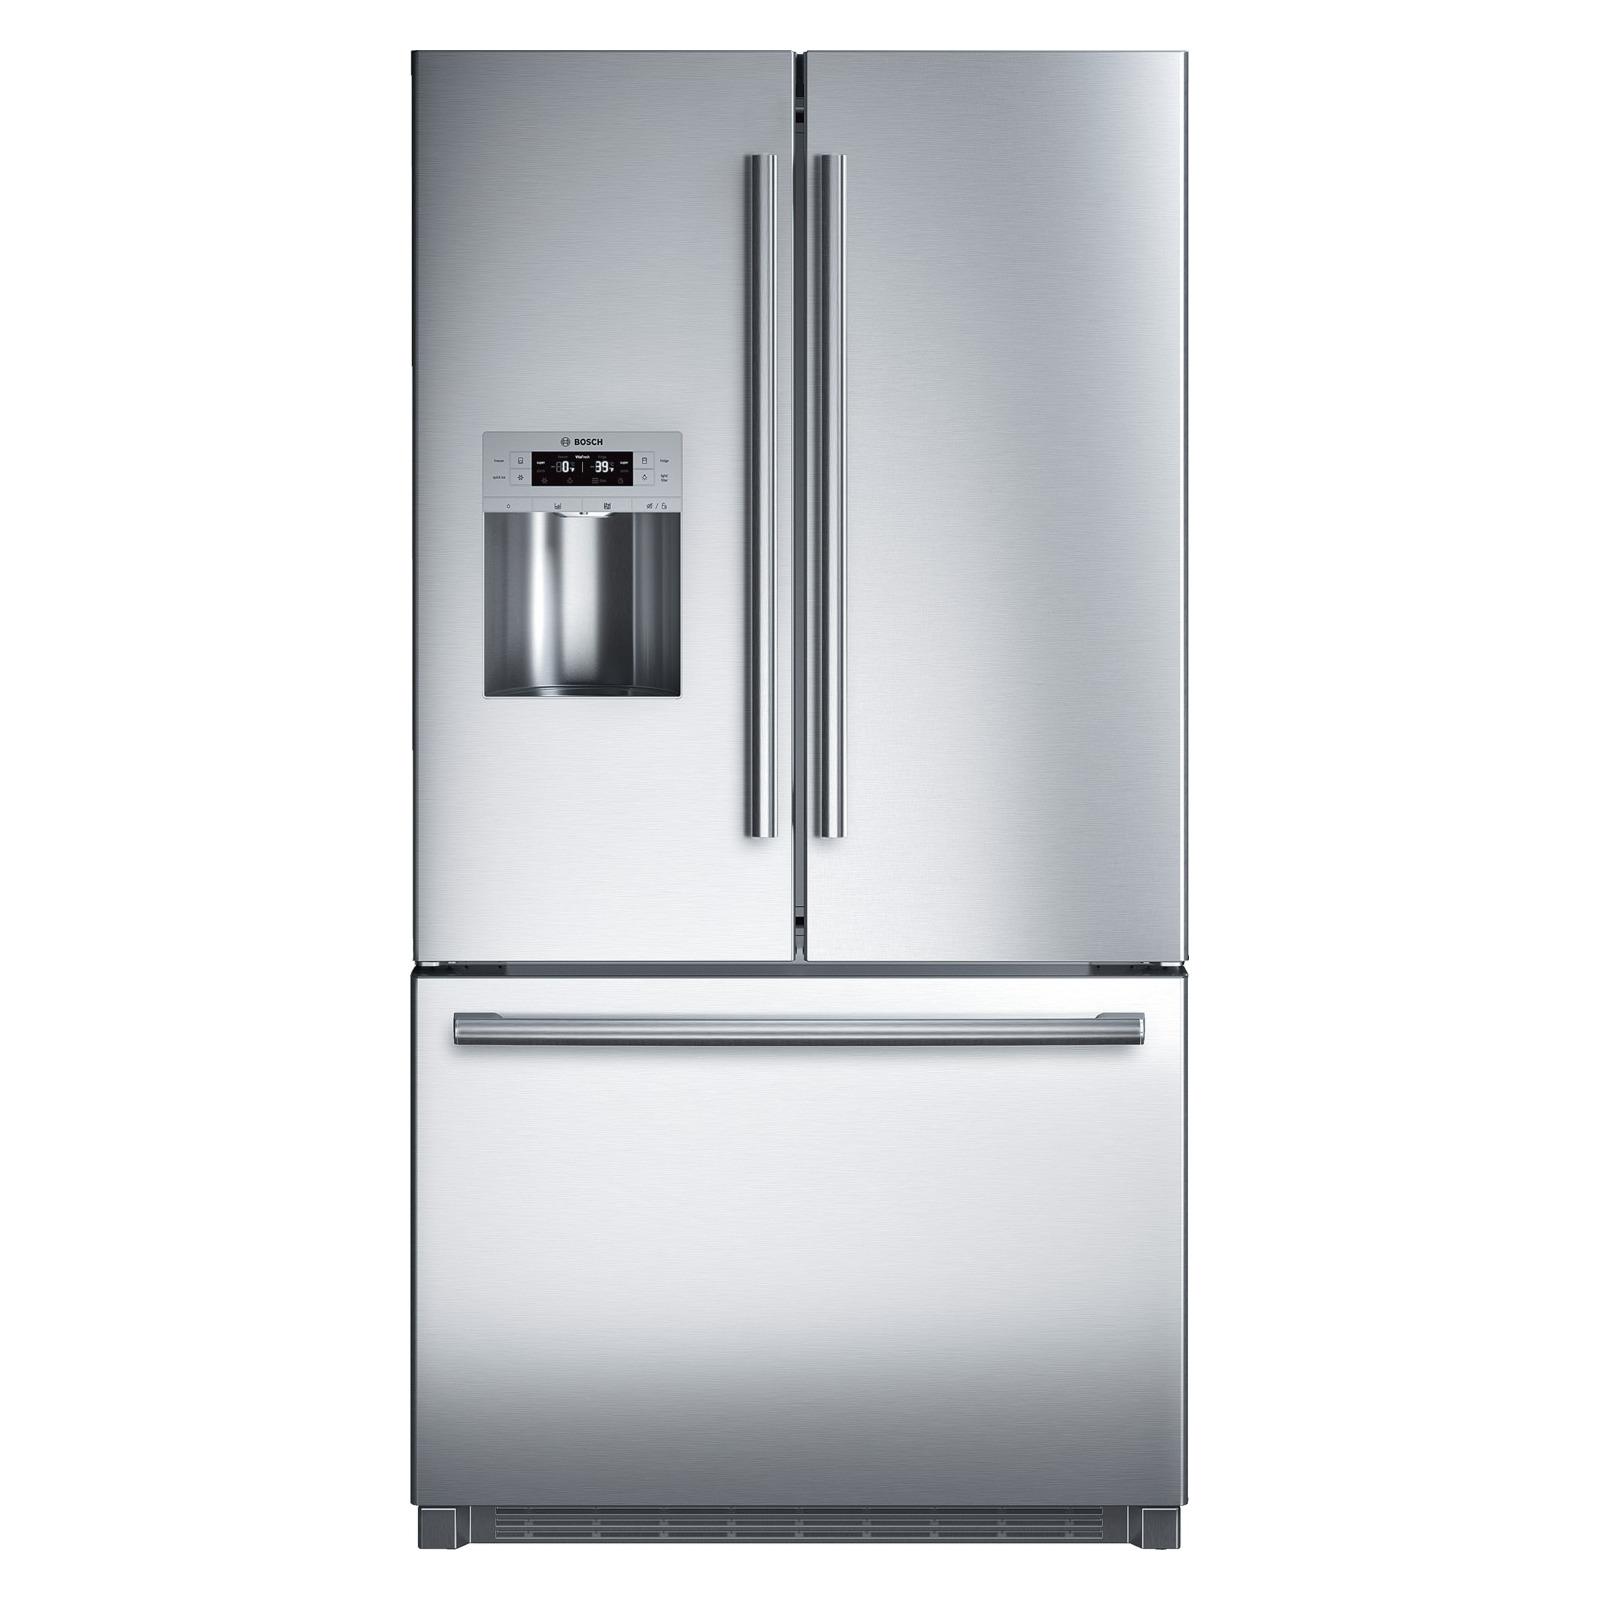 Bosch 25.9 cu. ft. French Door Bottom-Freezer Refrigerator